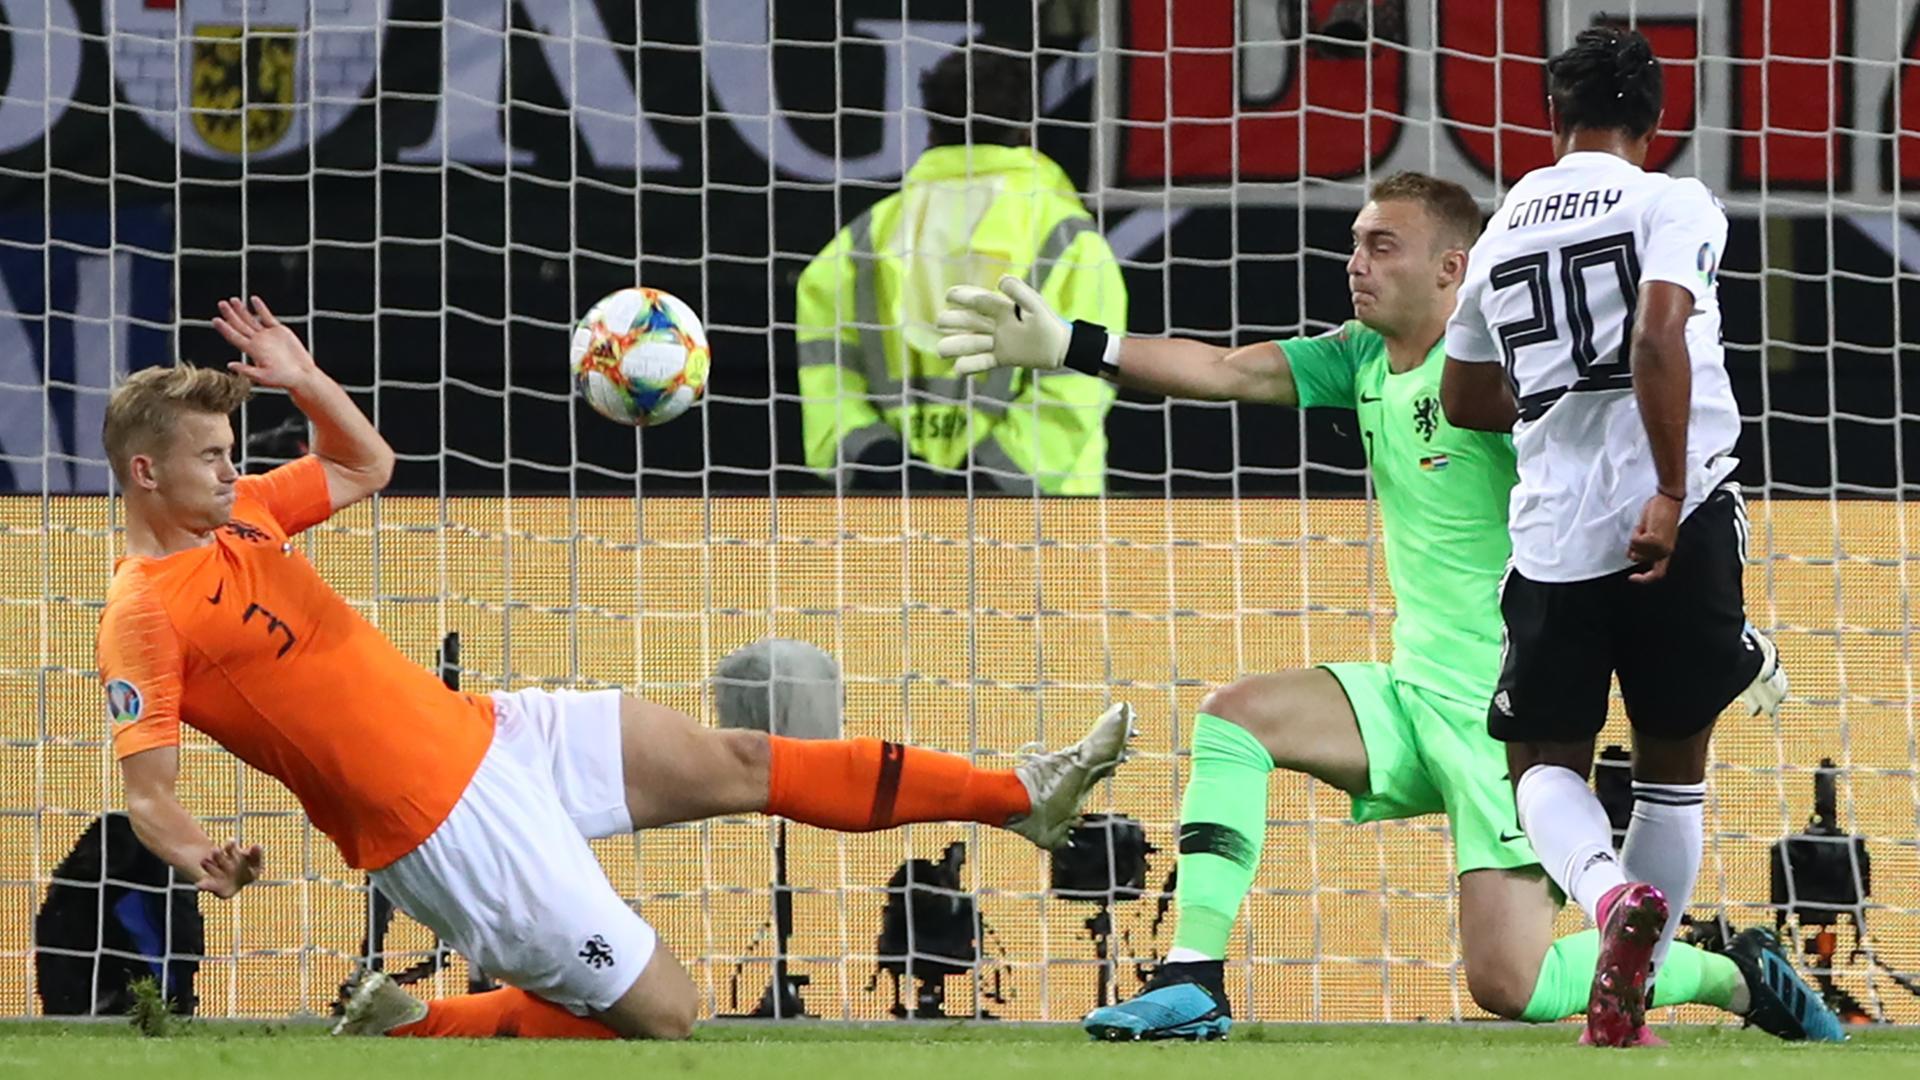 Fussball Em Quali Niederlande Besiegen Dfb Team Zdfmediathek